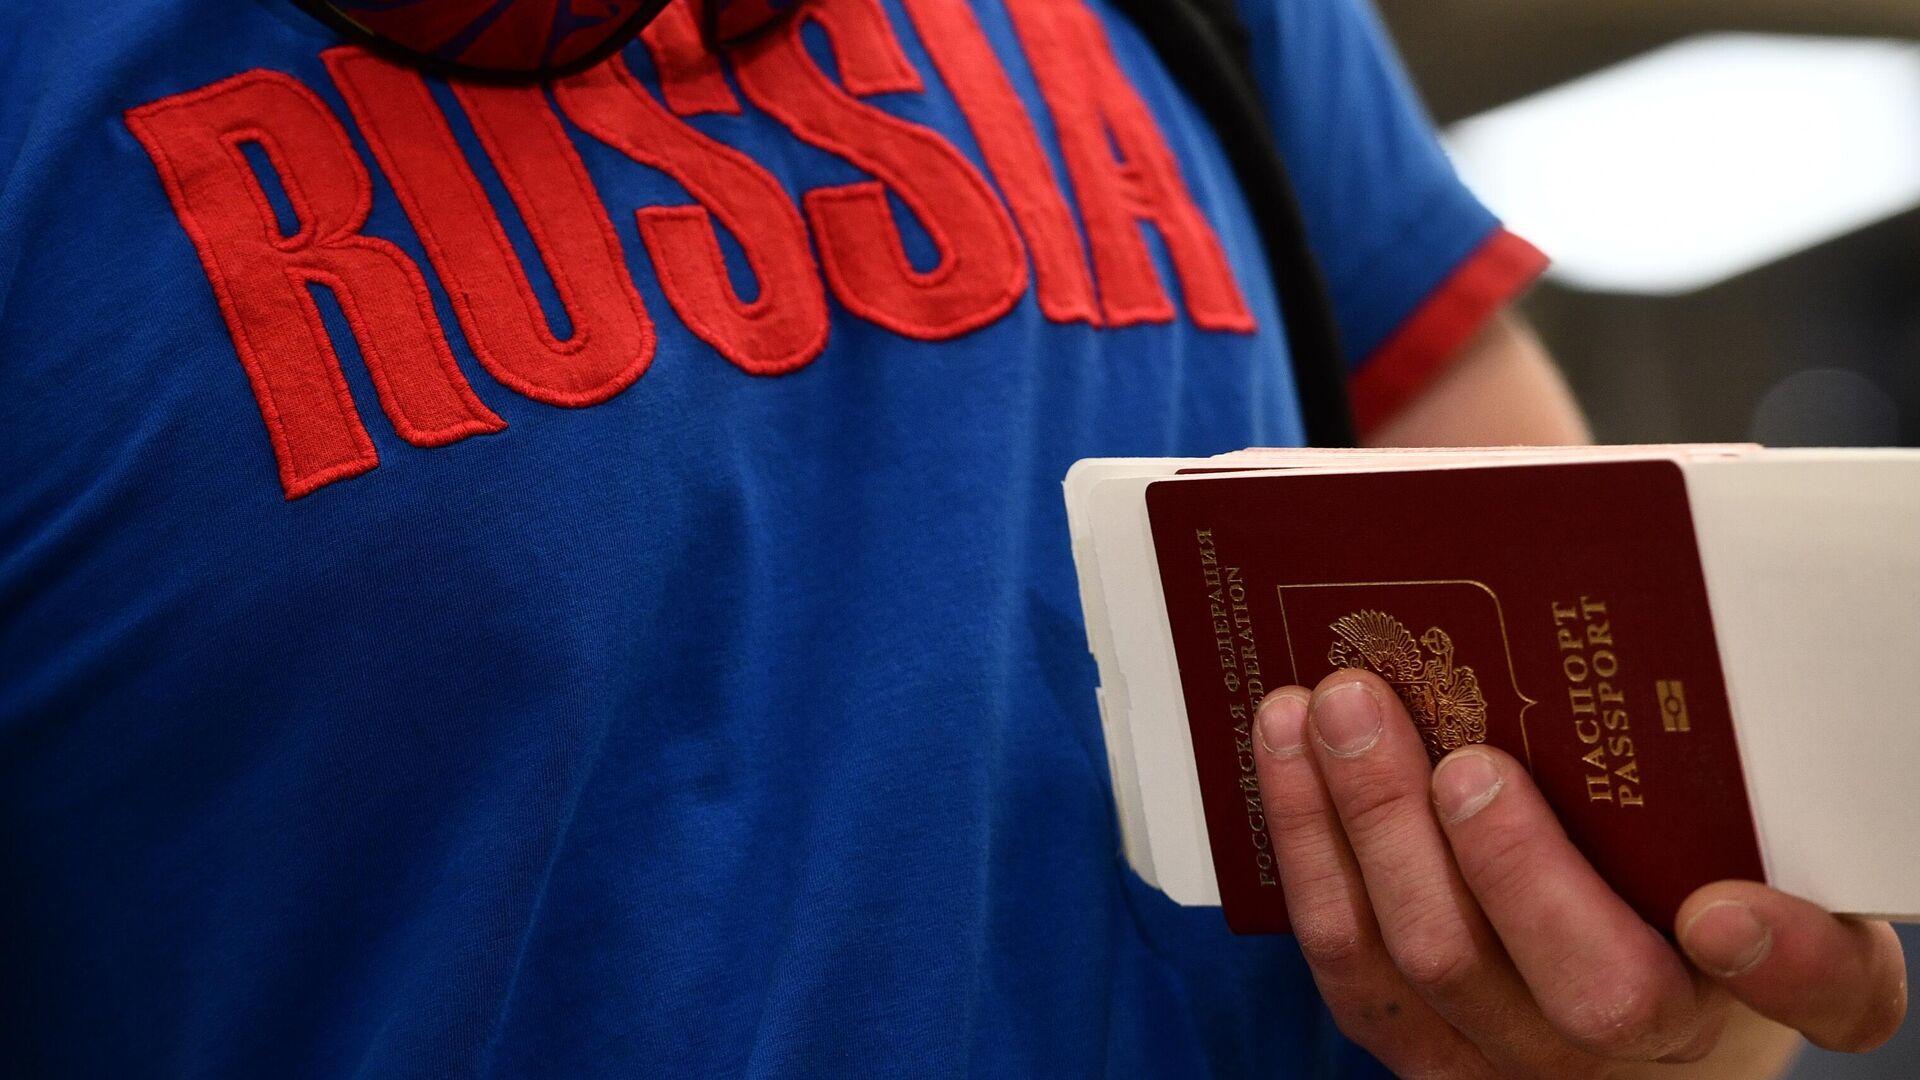 Rus turist, Türkiye, pasaport, koronavirüs - Sputnik Türkiye, 1920, 16.09.2021